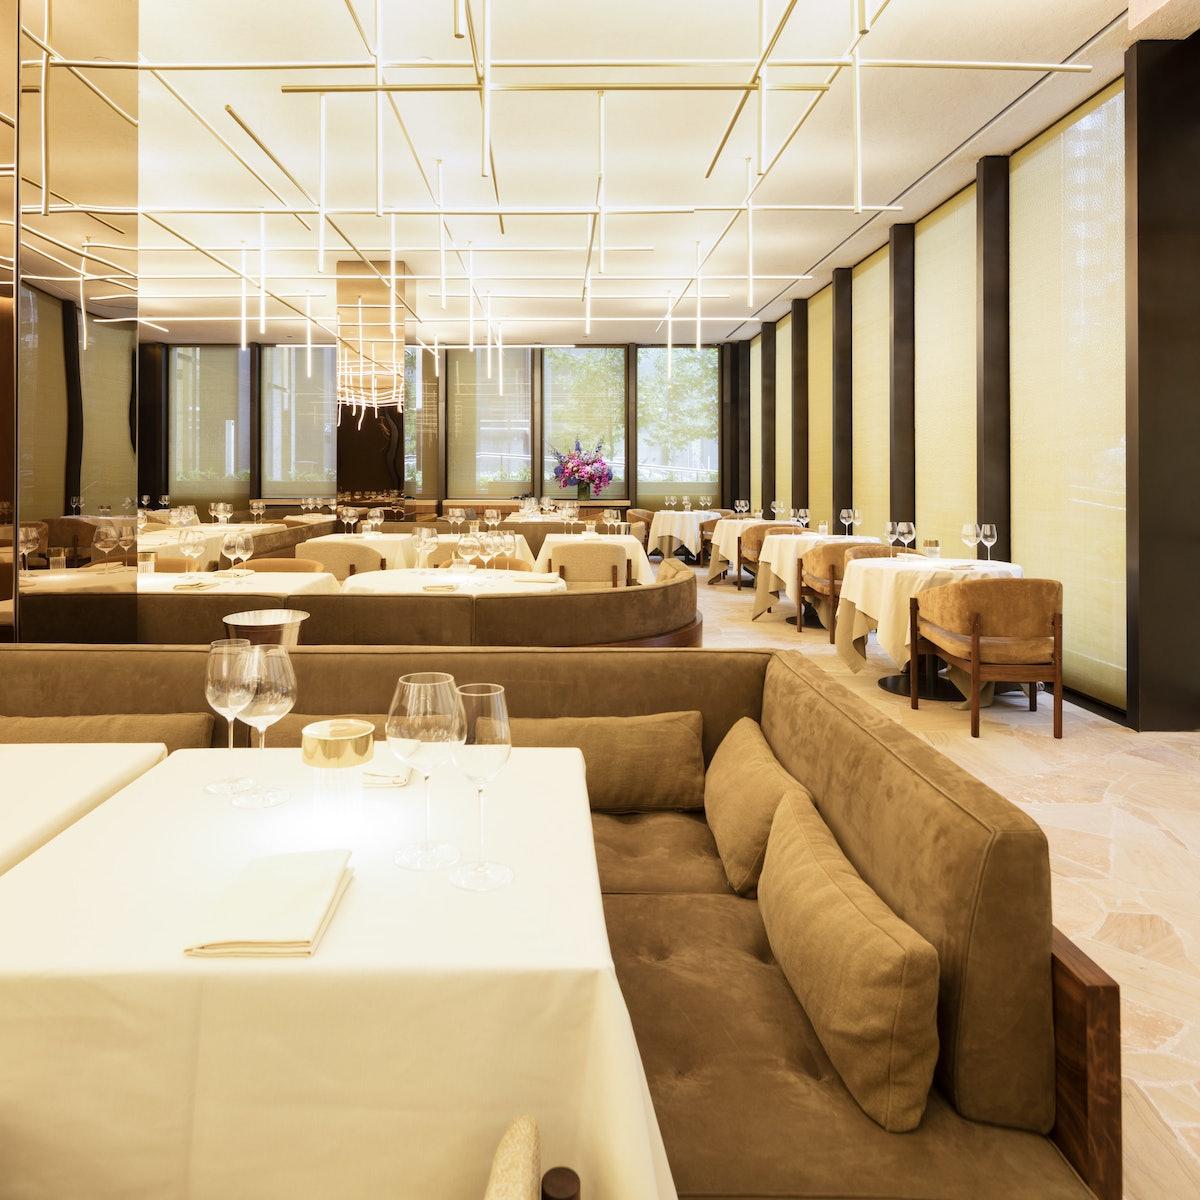 The Four Seasons_Dining Room 2_Fernando Guerra.JPG